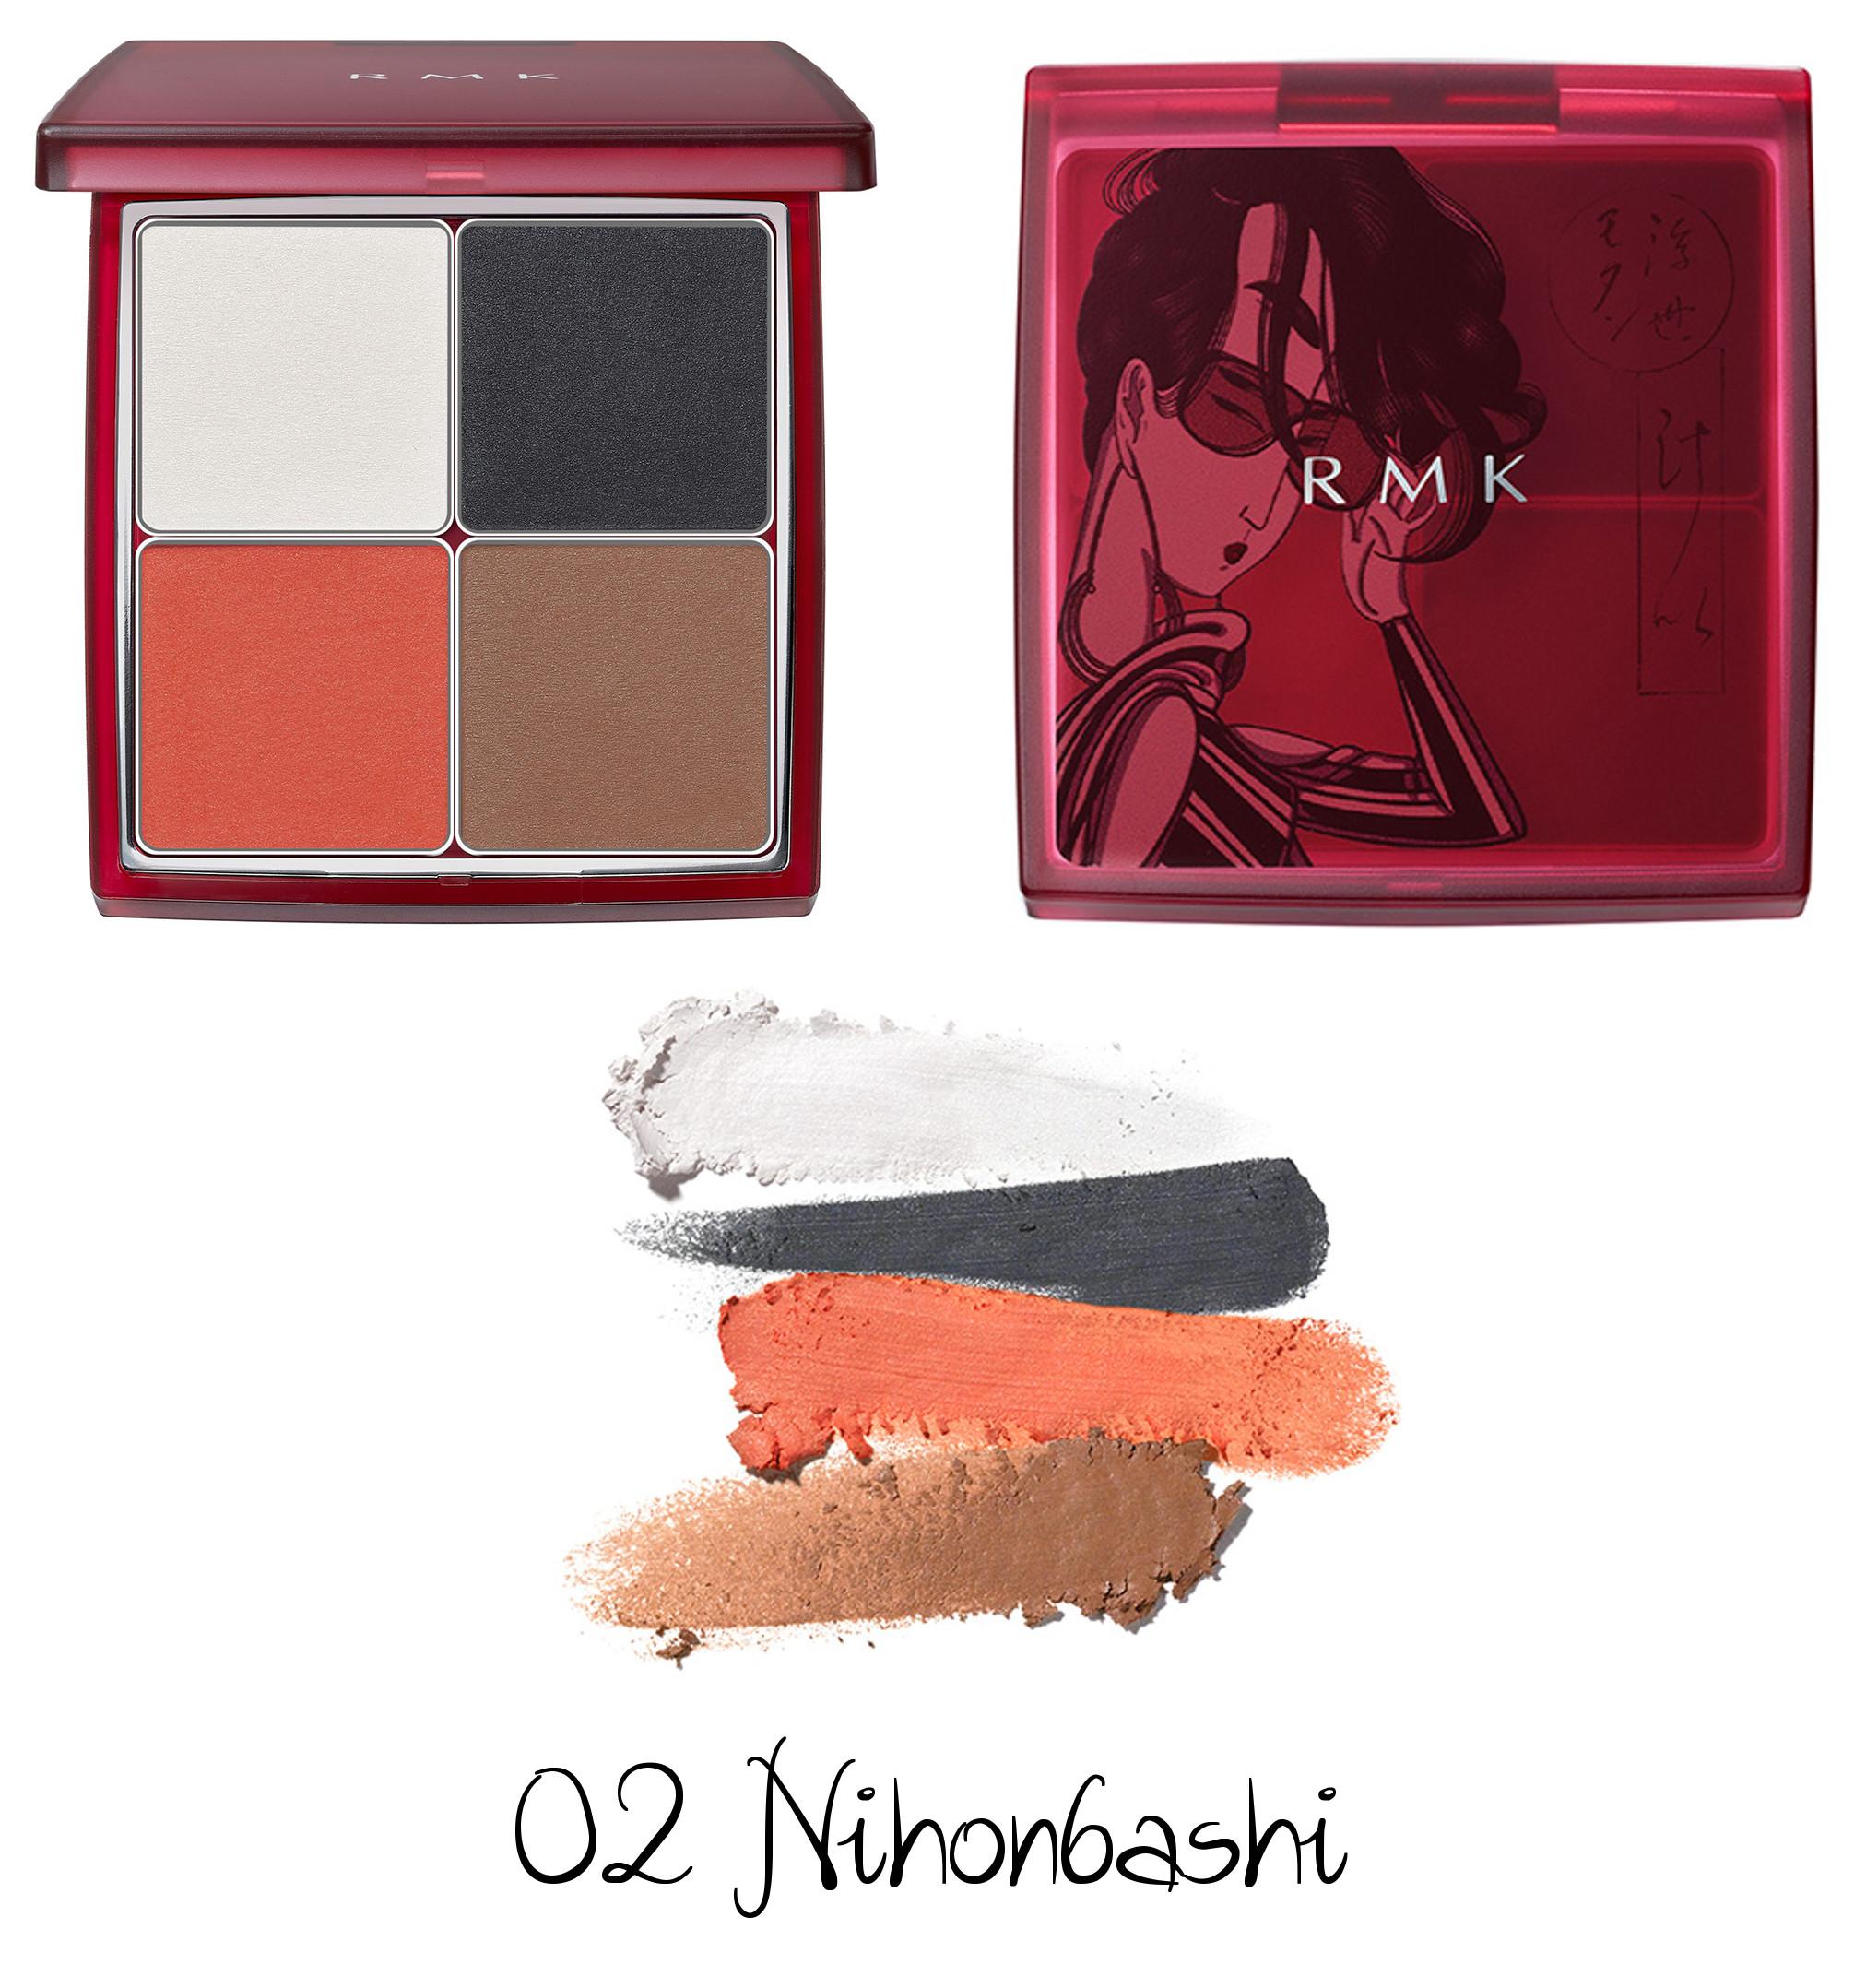 RMK Autumn Winter Collection 2020 Ukiyo Modern Eyeshadow Palette 02 Nihonbashi